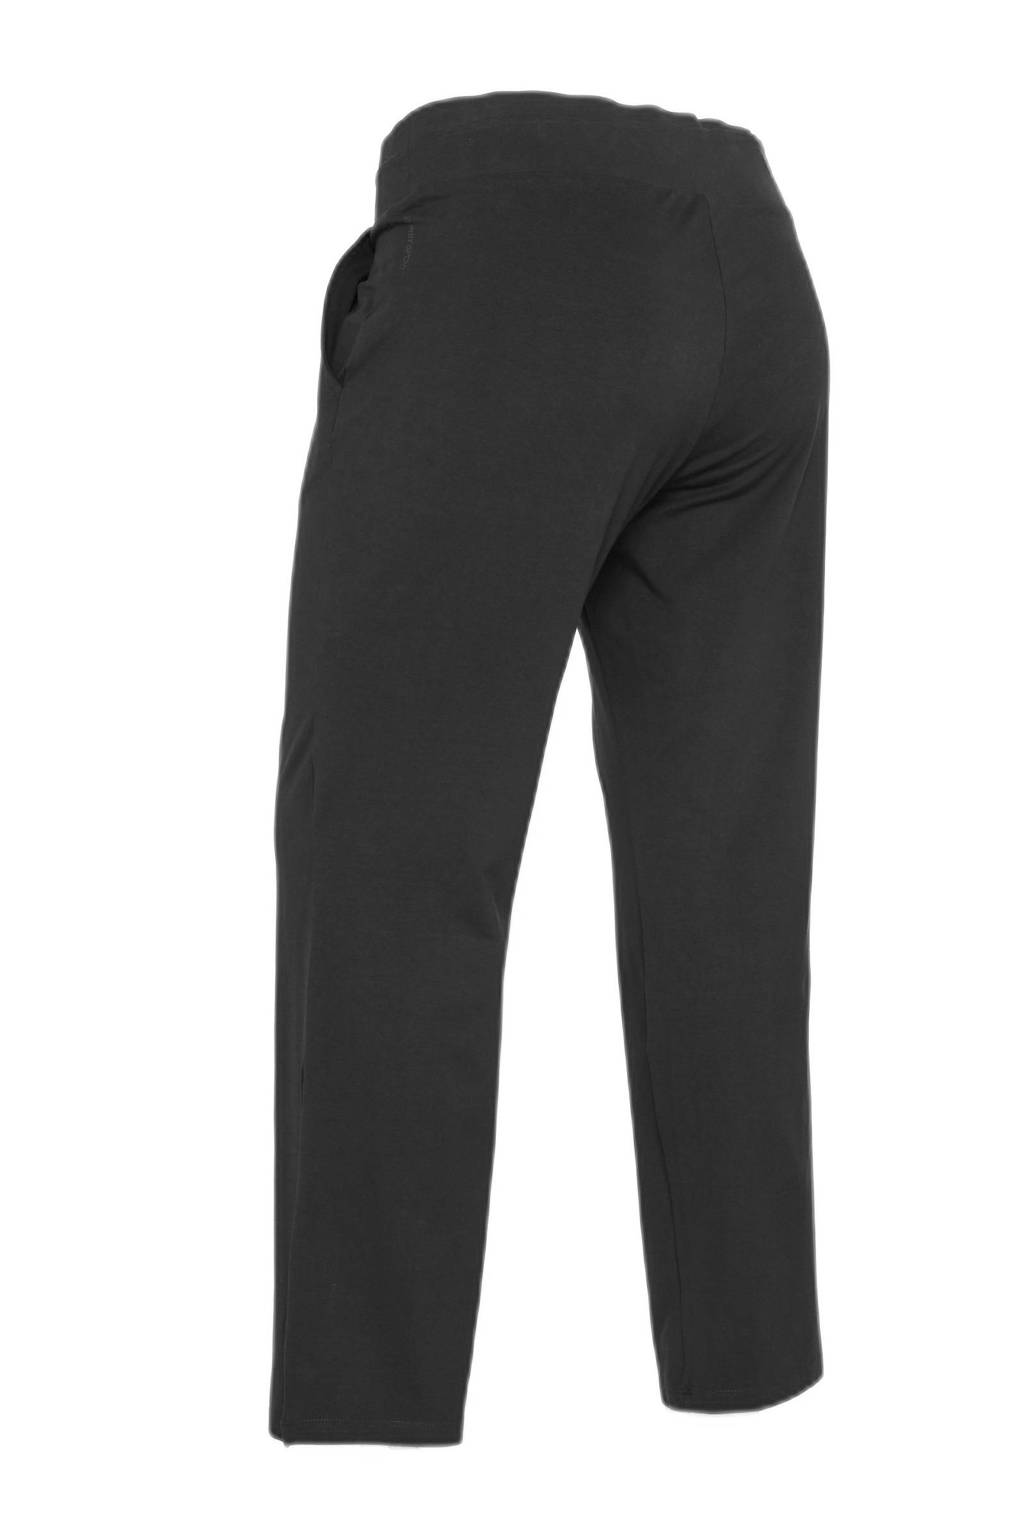 ESPRIT Women Sports Plus Size joggingbroek zwart, Zwart